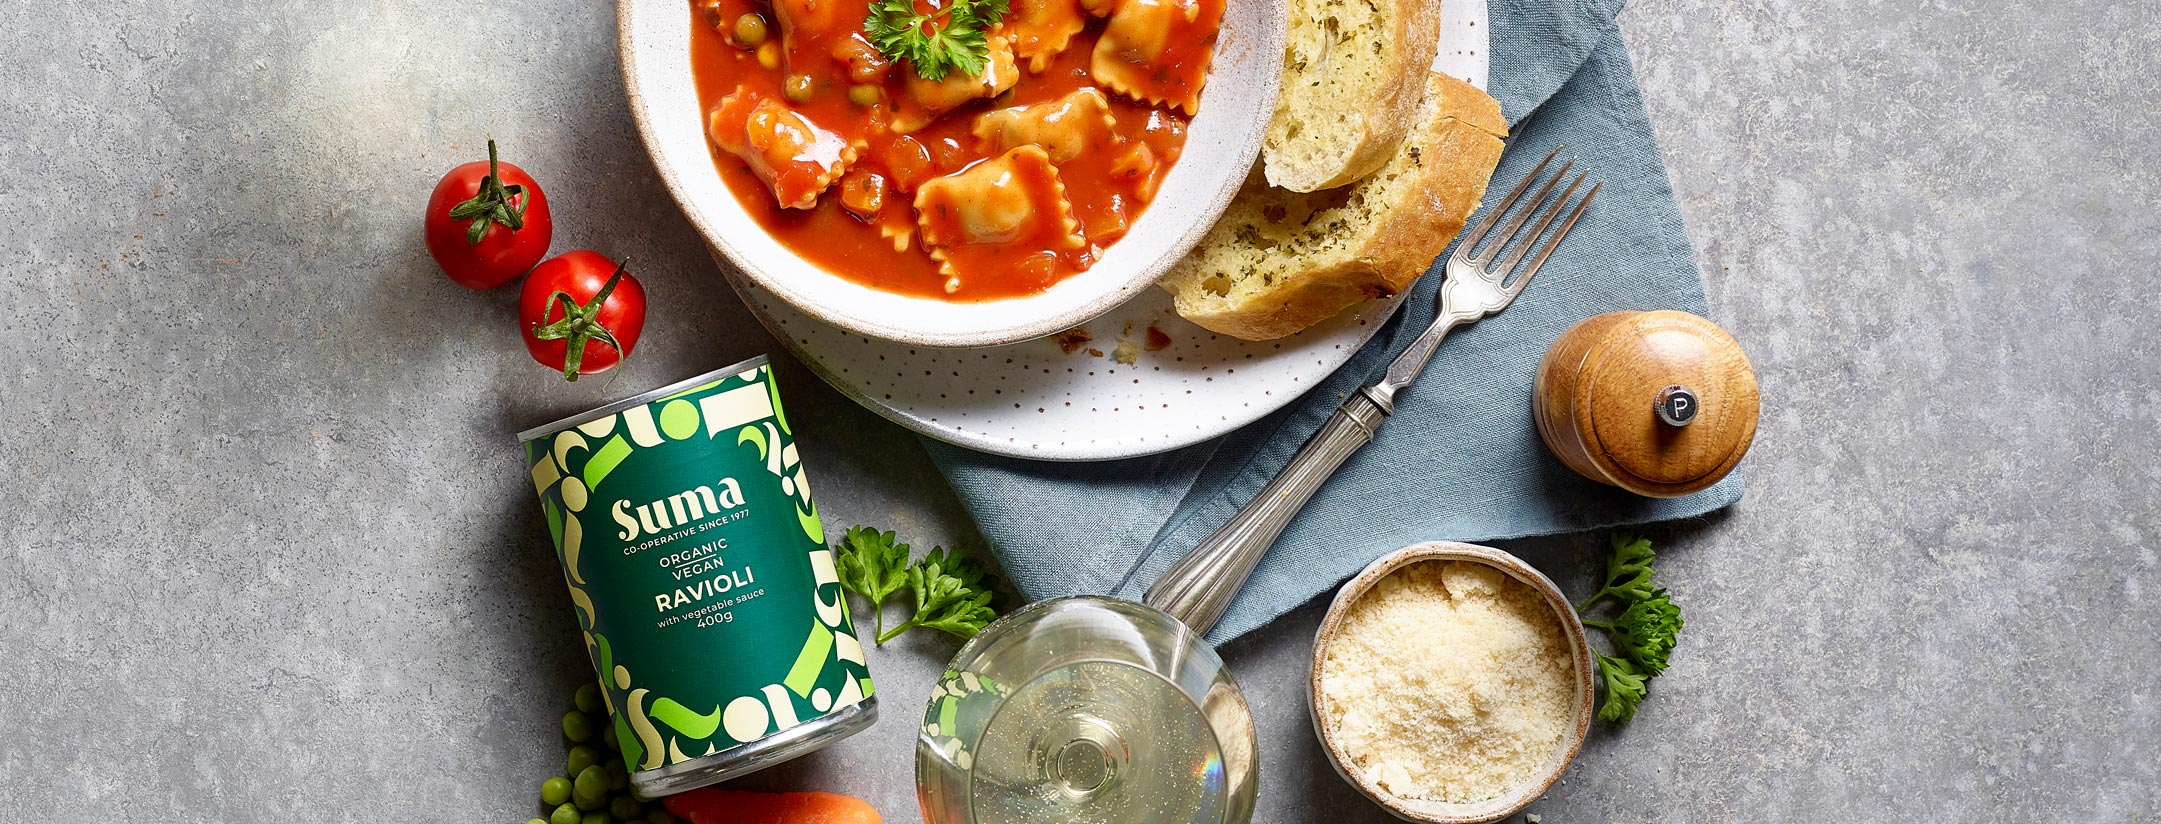 Suma Ravioli, Veganuary treats!